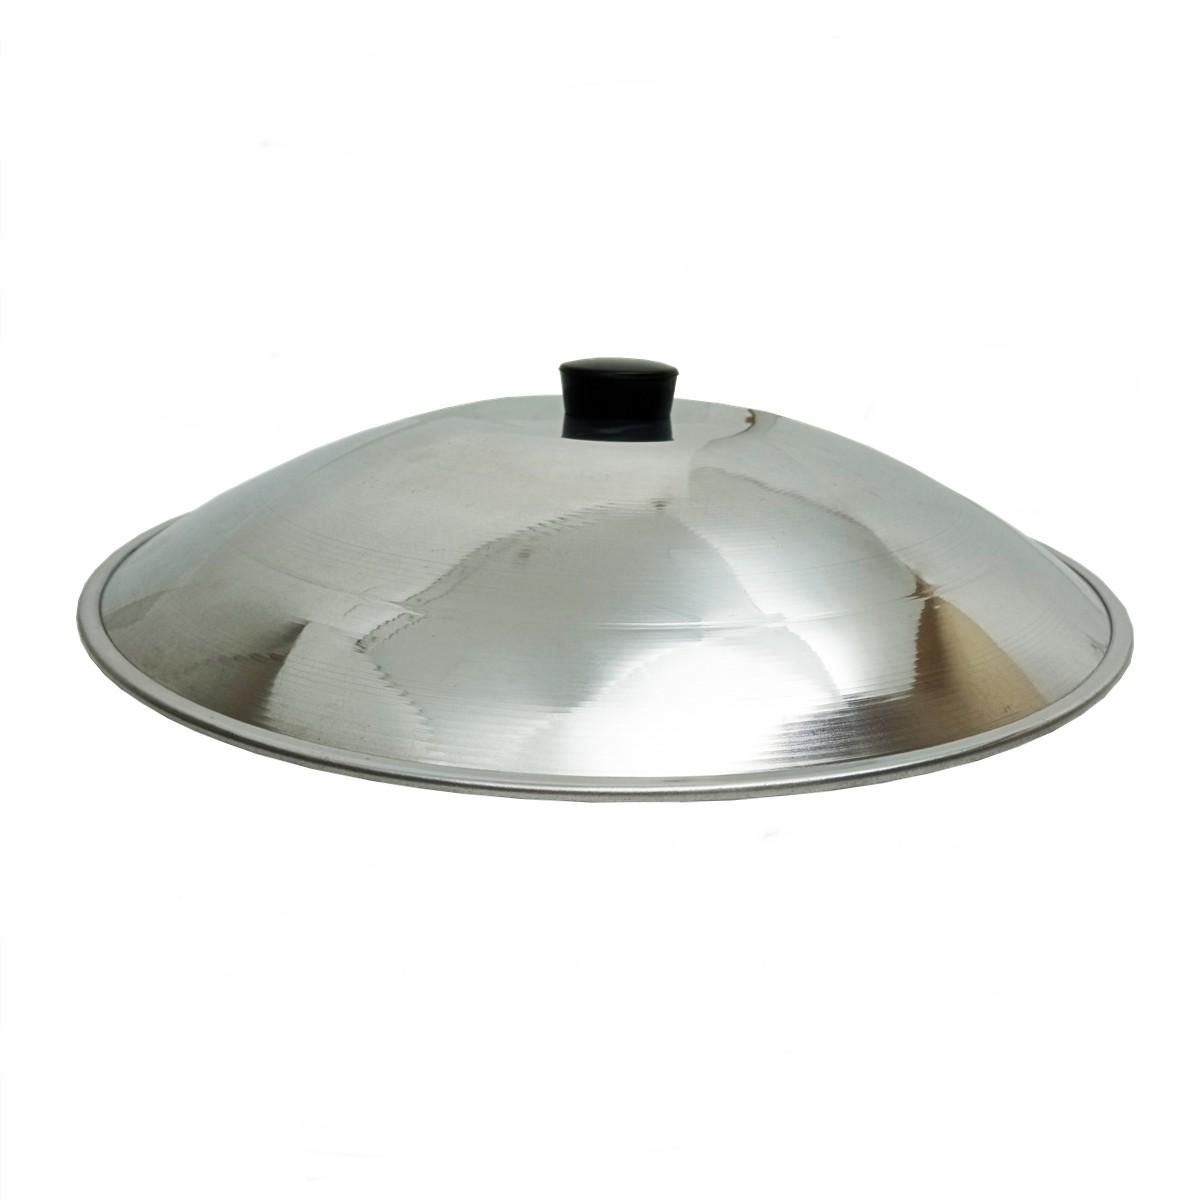 Tampa de Alumínio para Wok Tacho 37 41 36,5cm - Torki